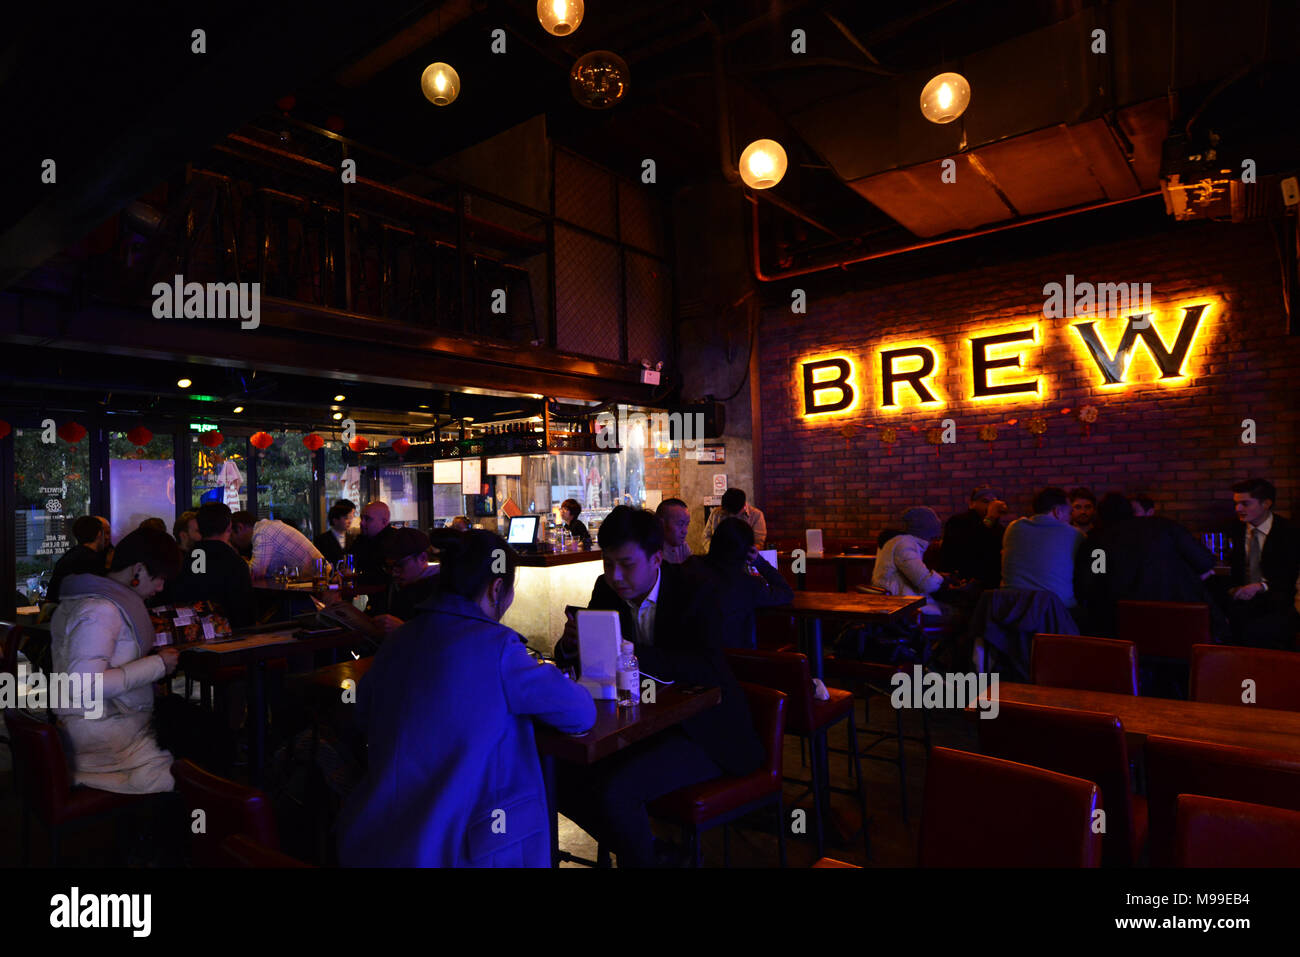 The Brew bar & restaurant in Futian, Shenzhen. - Stock Image